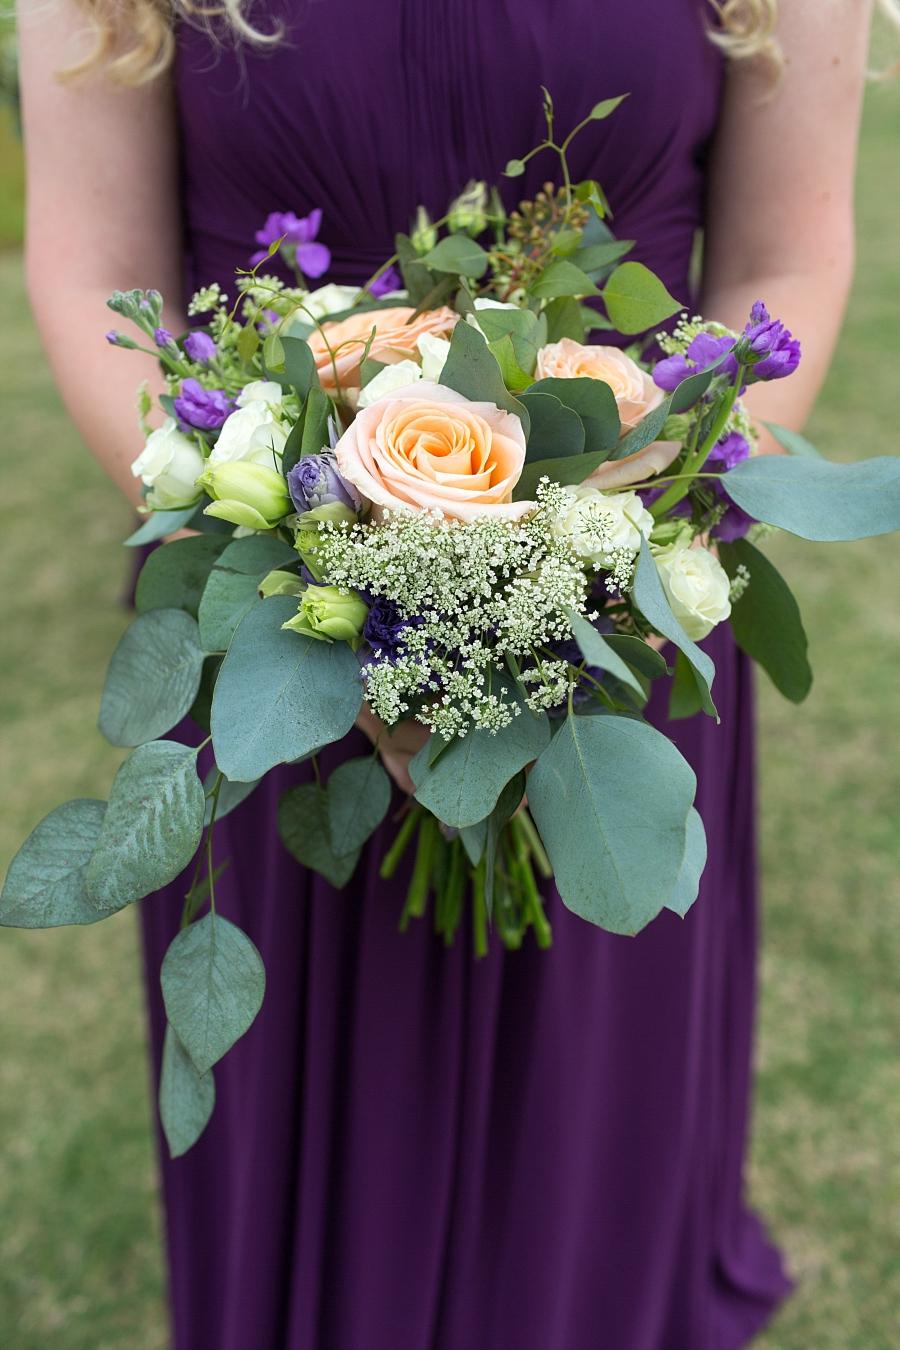 Stacy-Anderson-Photography-The-Farmhouse-Houston-Wedding-Photographer_0106.jpg